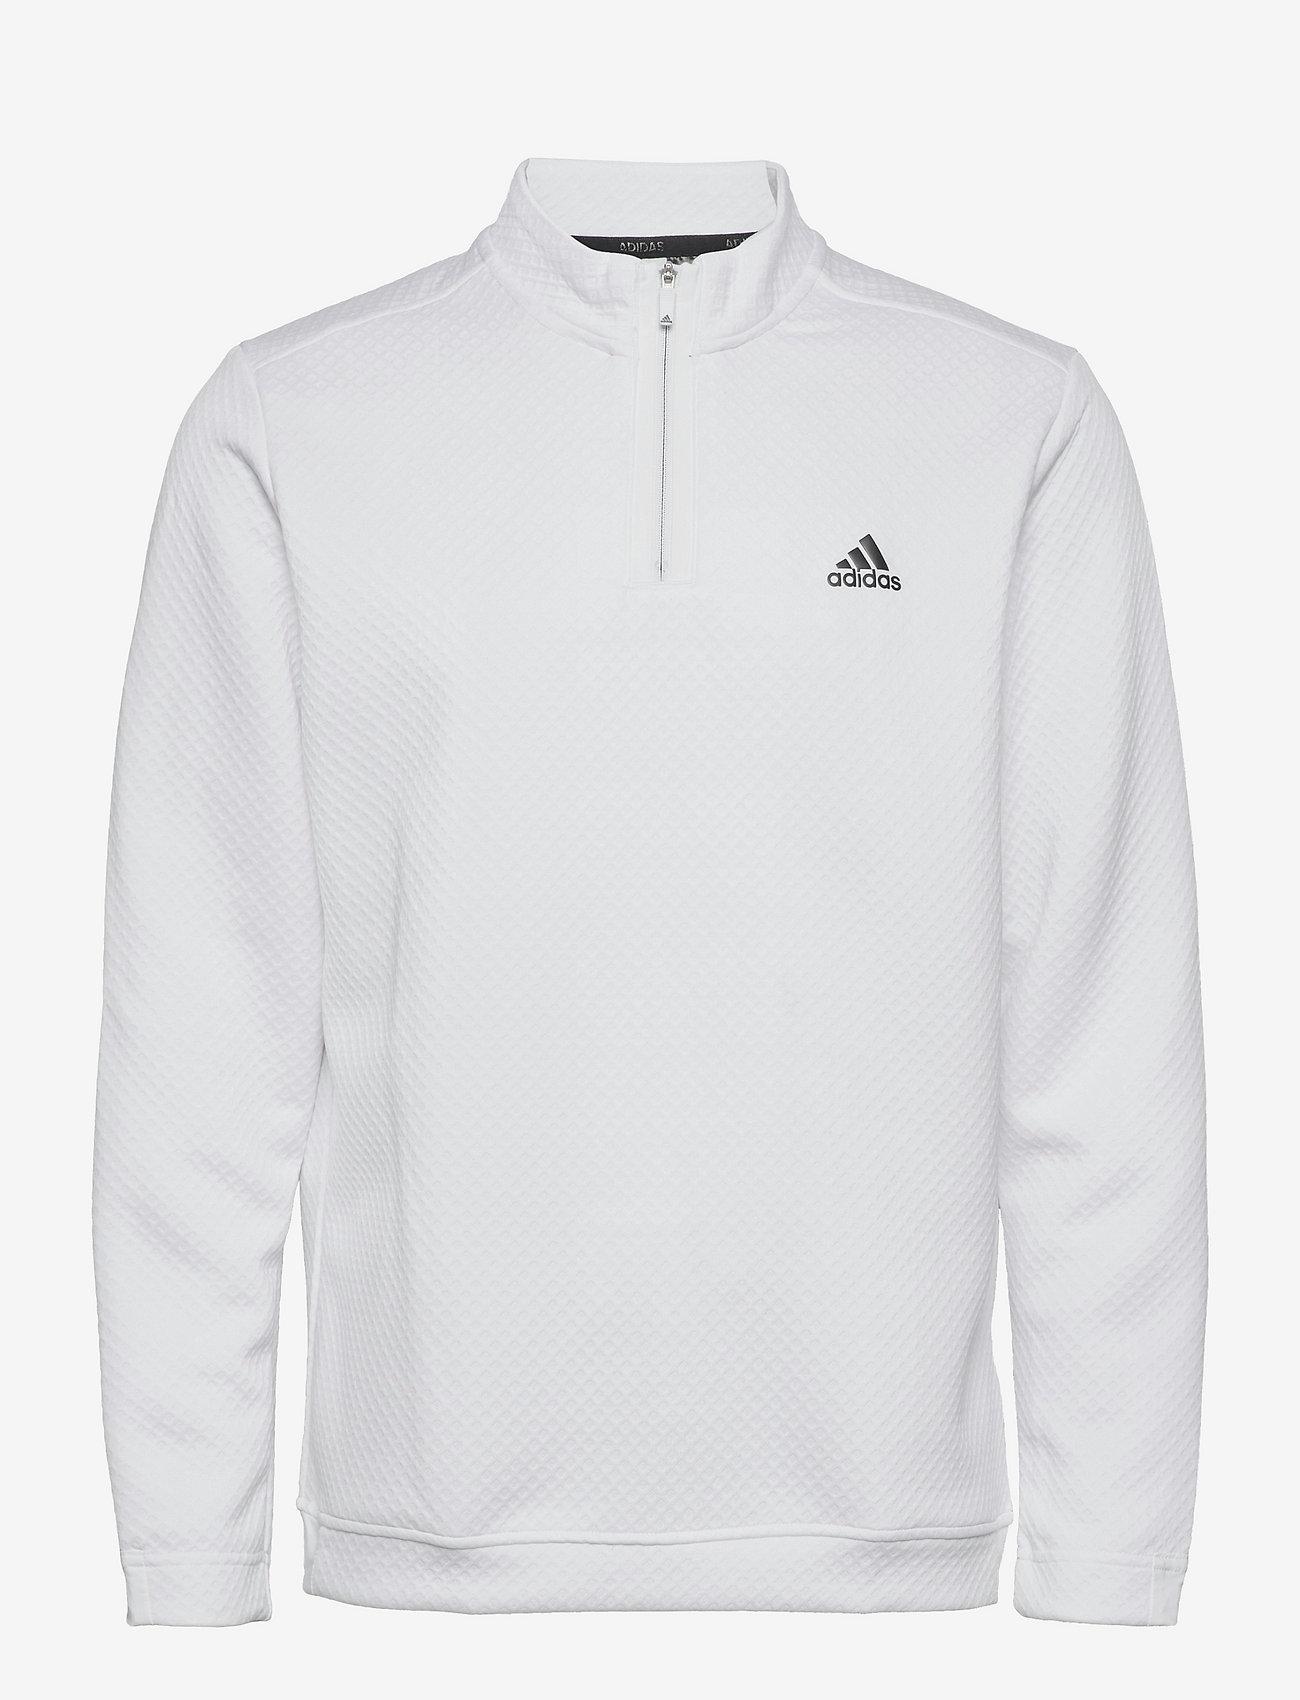 adidas Golf - DWR 1/4 ZIP - sweats - white - 1